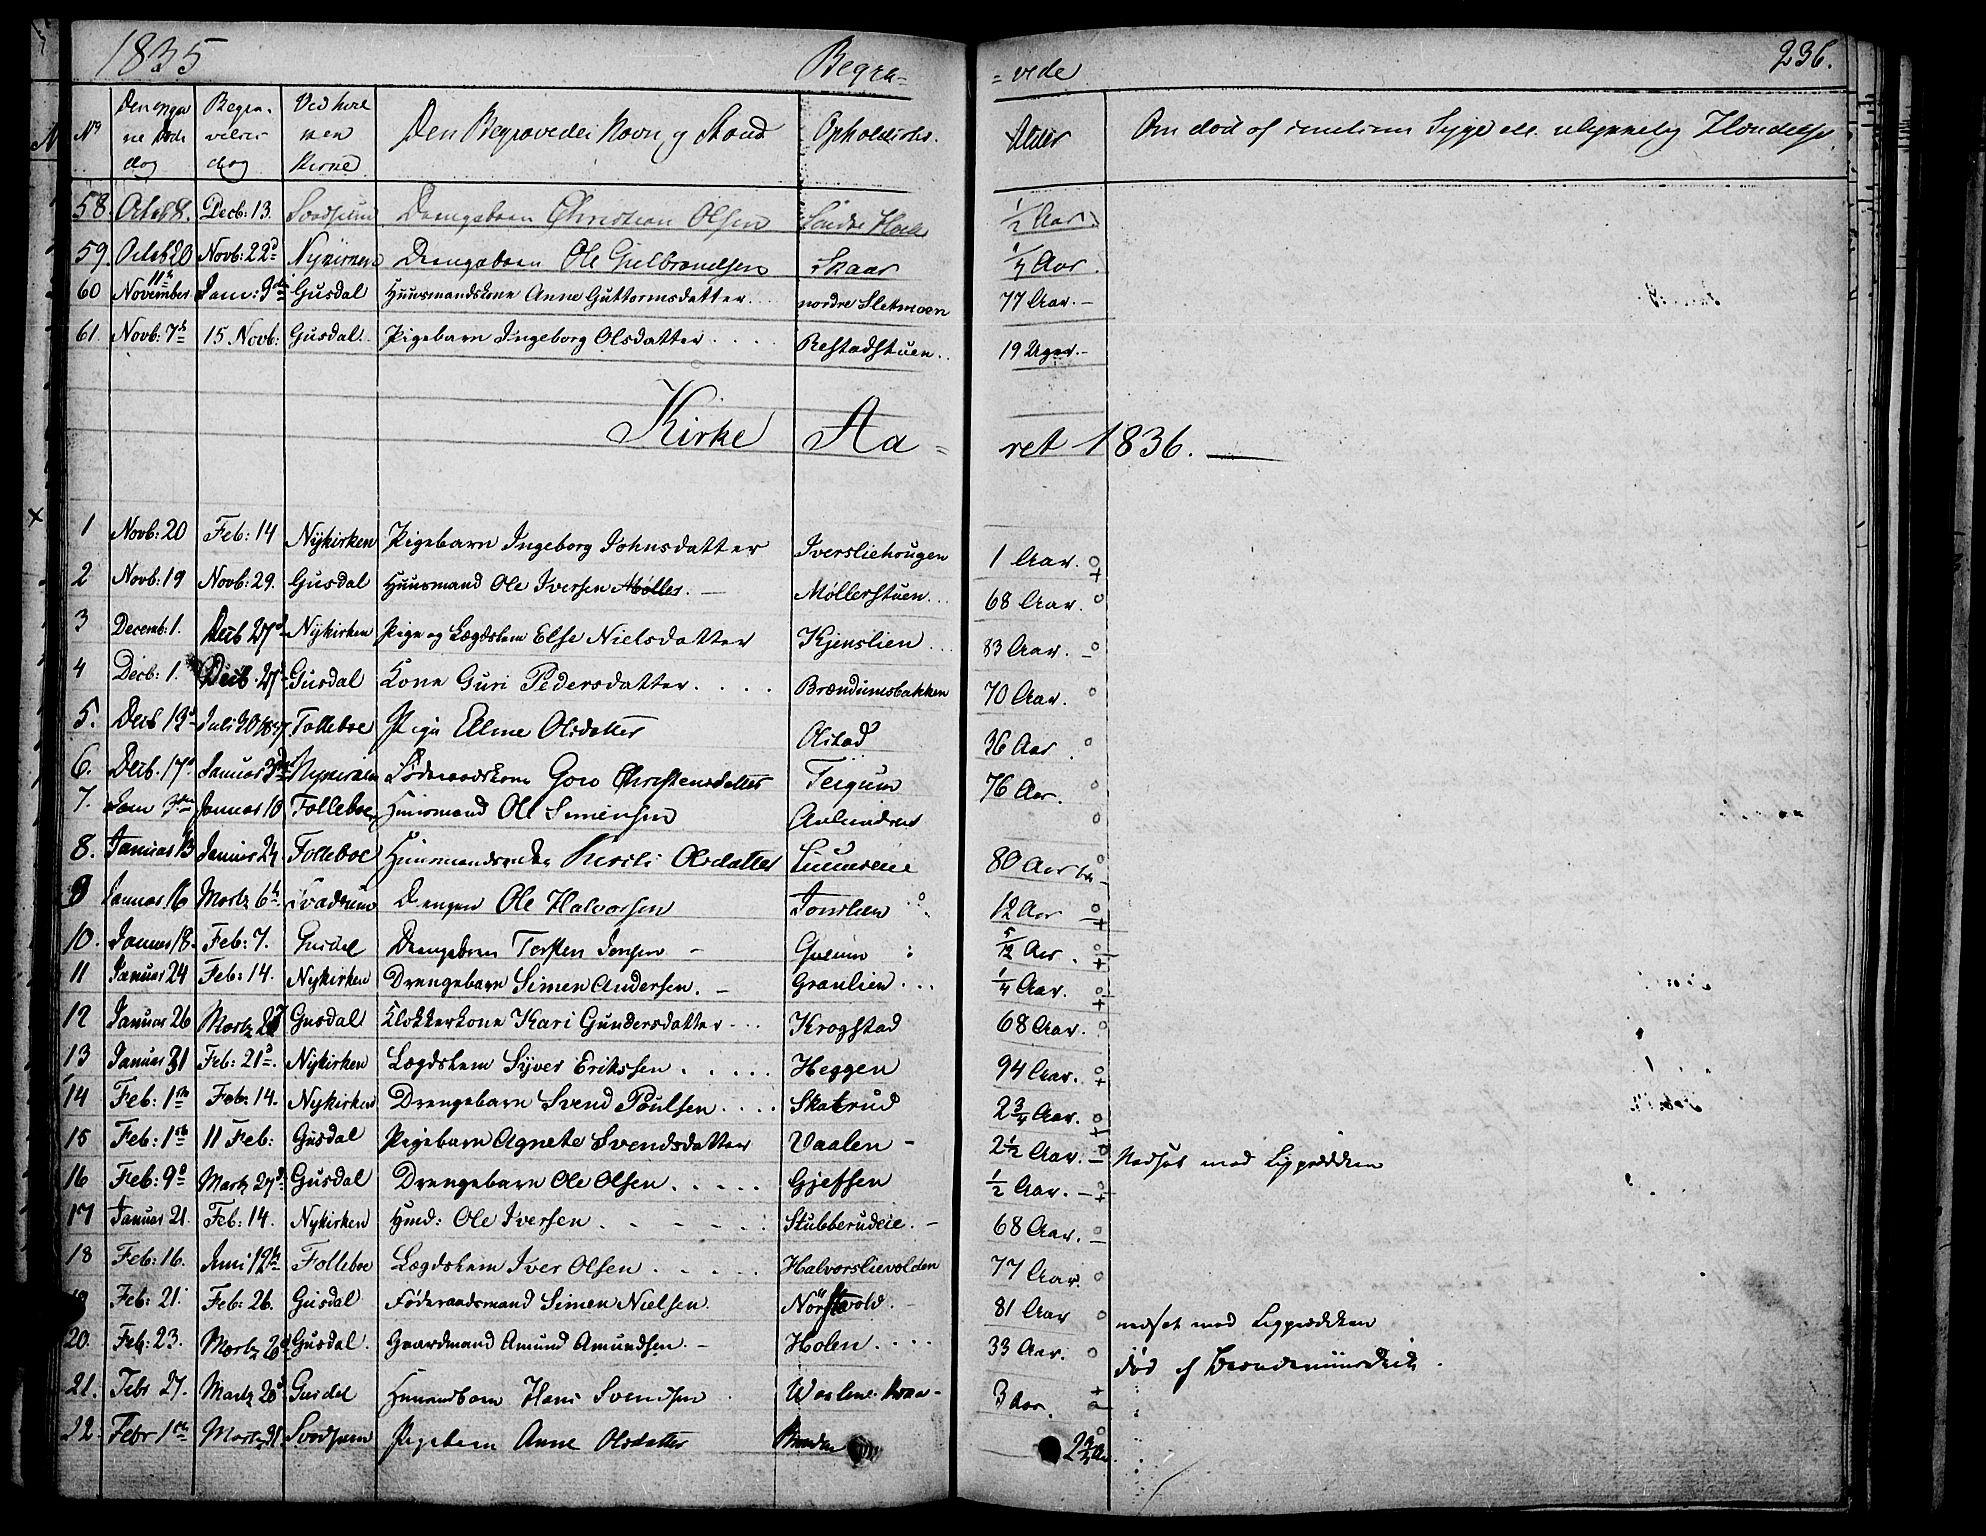 SAH, Gausdal prestekontor, Ministerialbok nr. 6, 1830-1839, s. 236